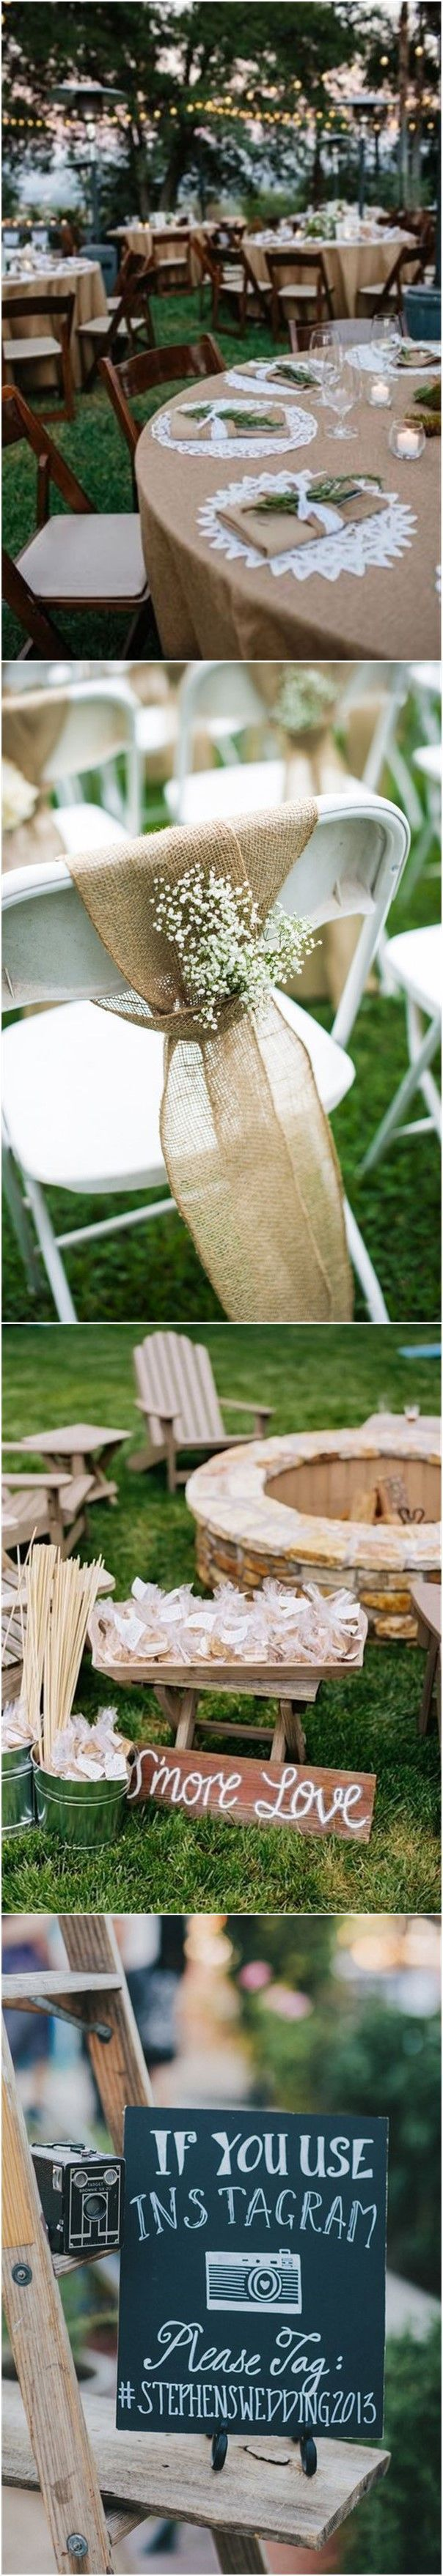 22 Rustic Backyard Wedding Decoration Ideas on A Budget #weddingonabudget